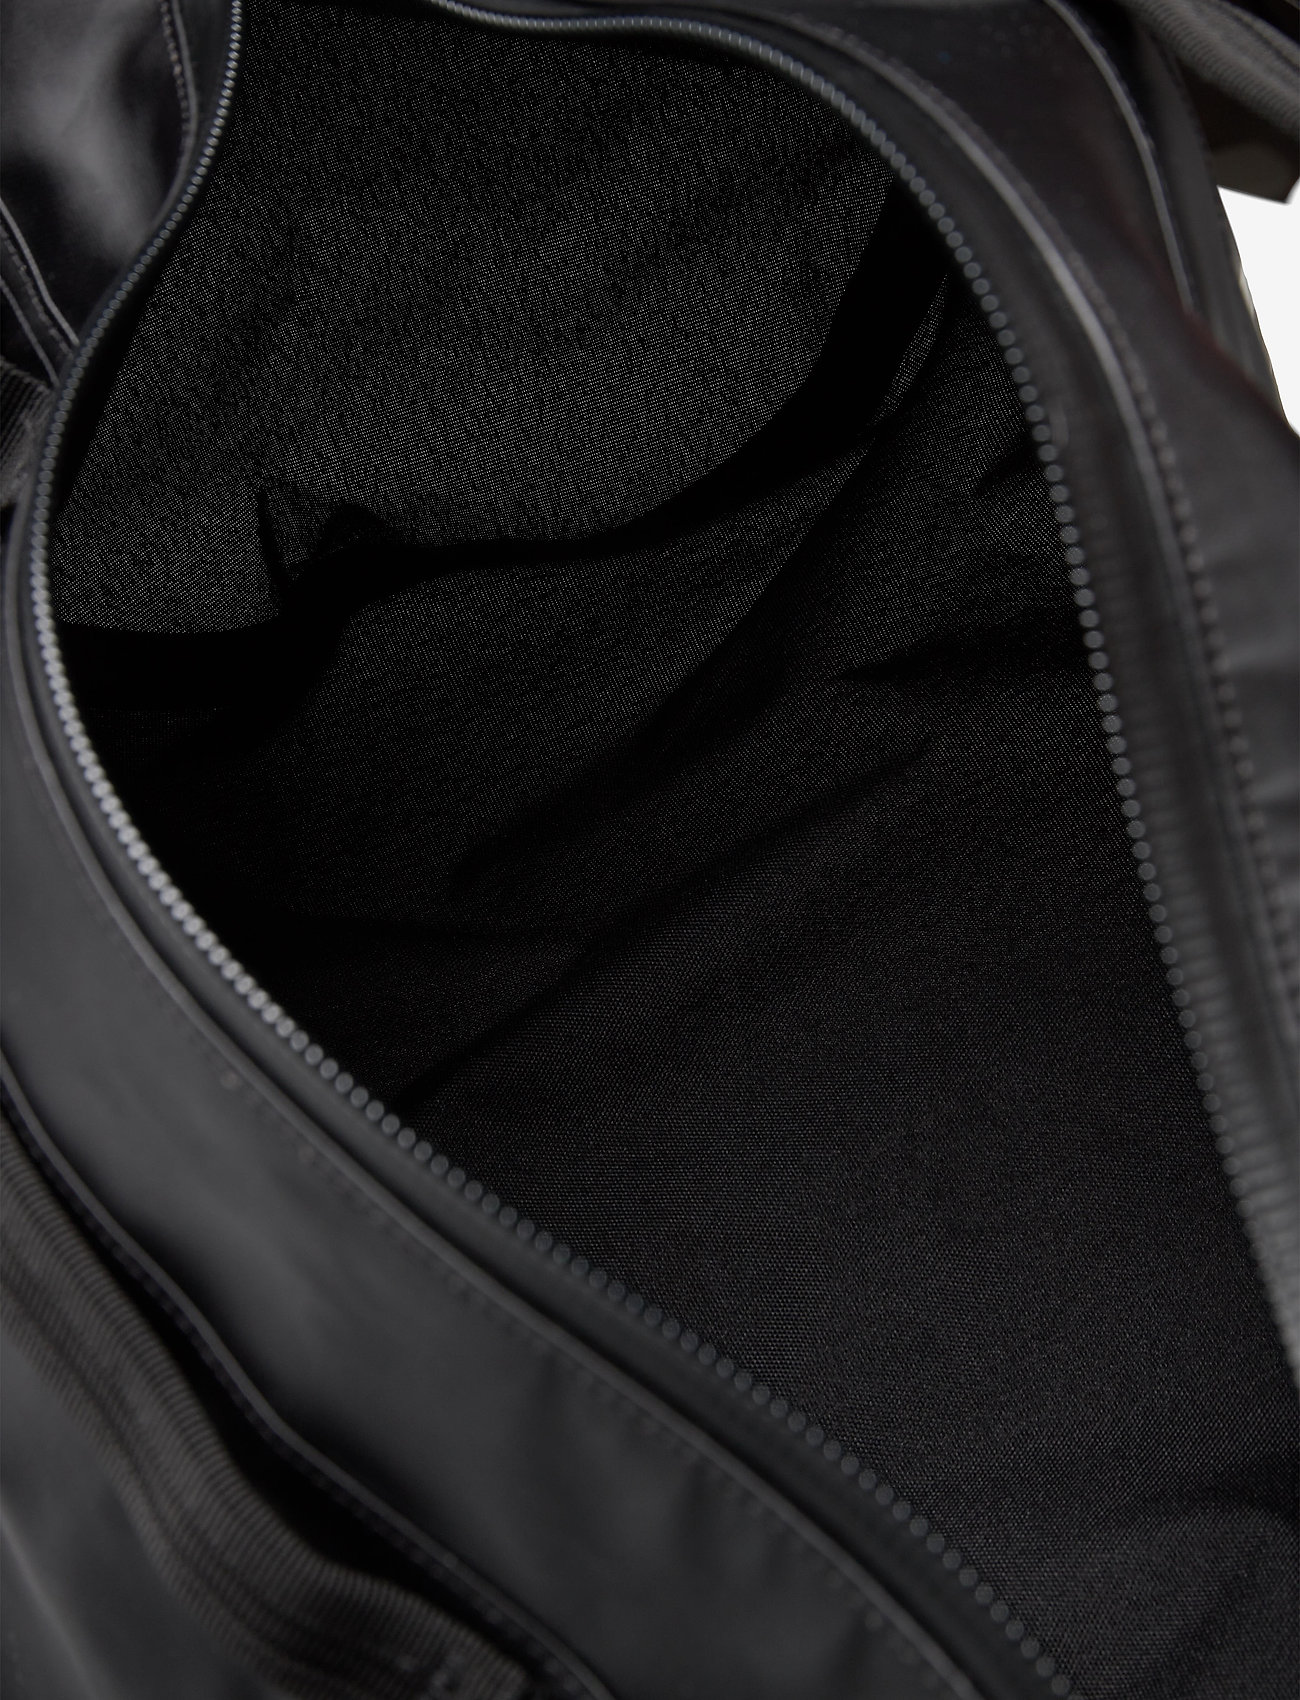 Columbia - OutDry Ex 80L Duffle - sacs de sport - black - 1